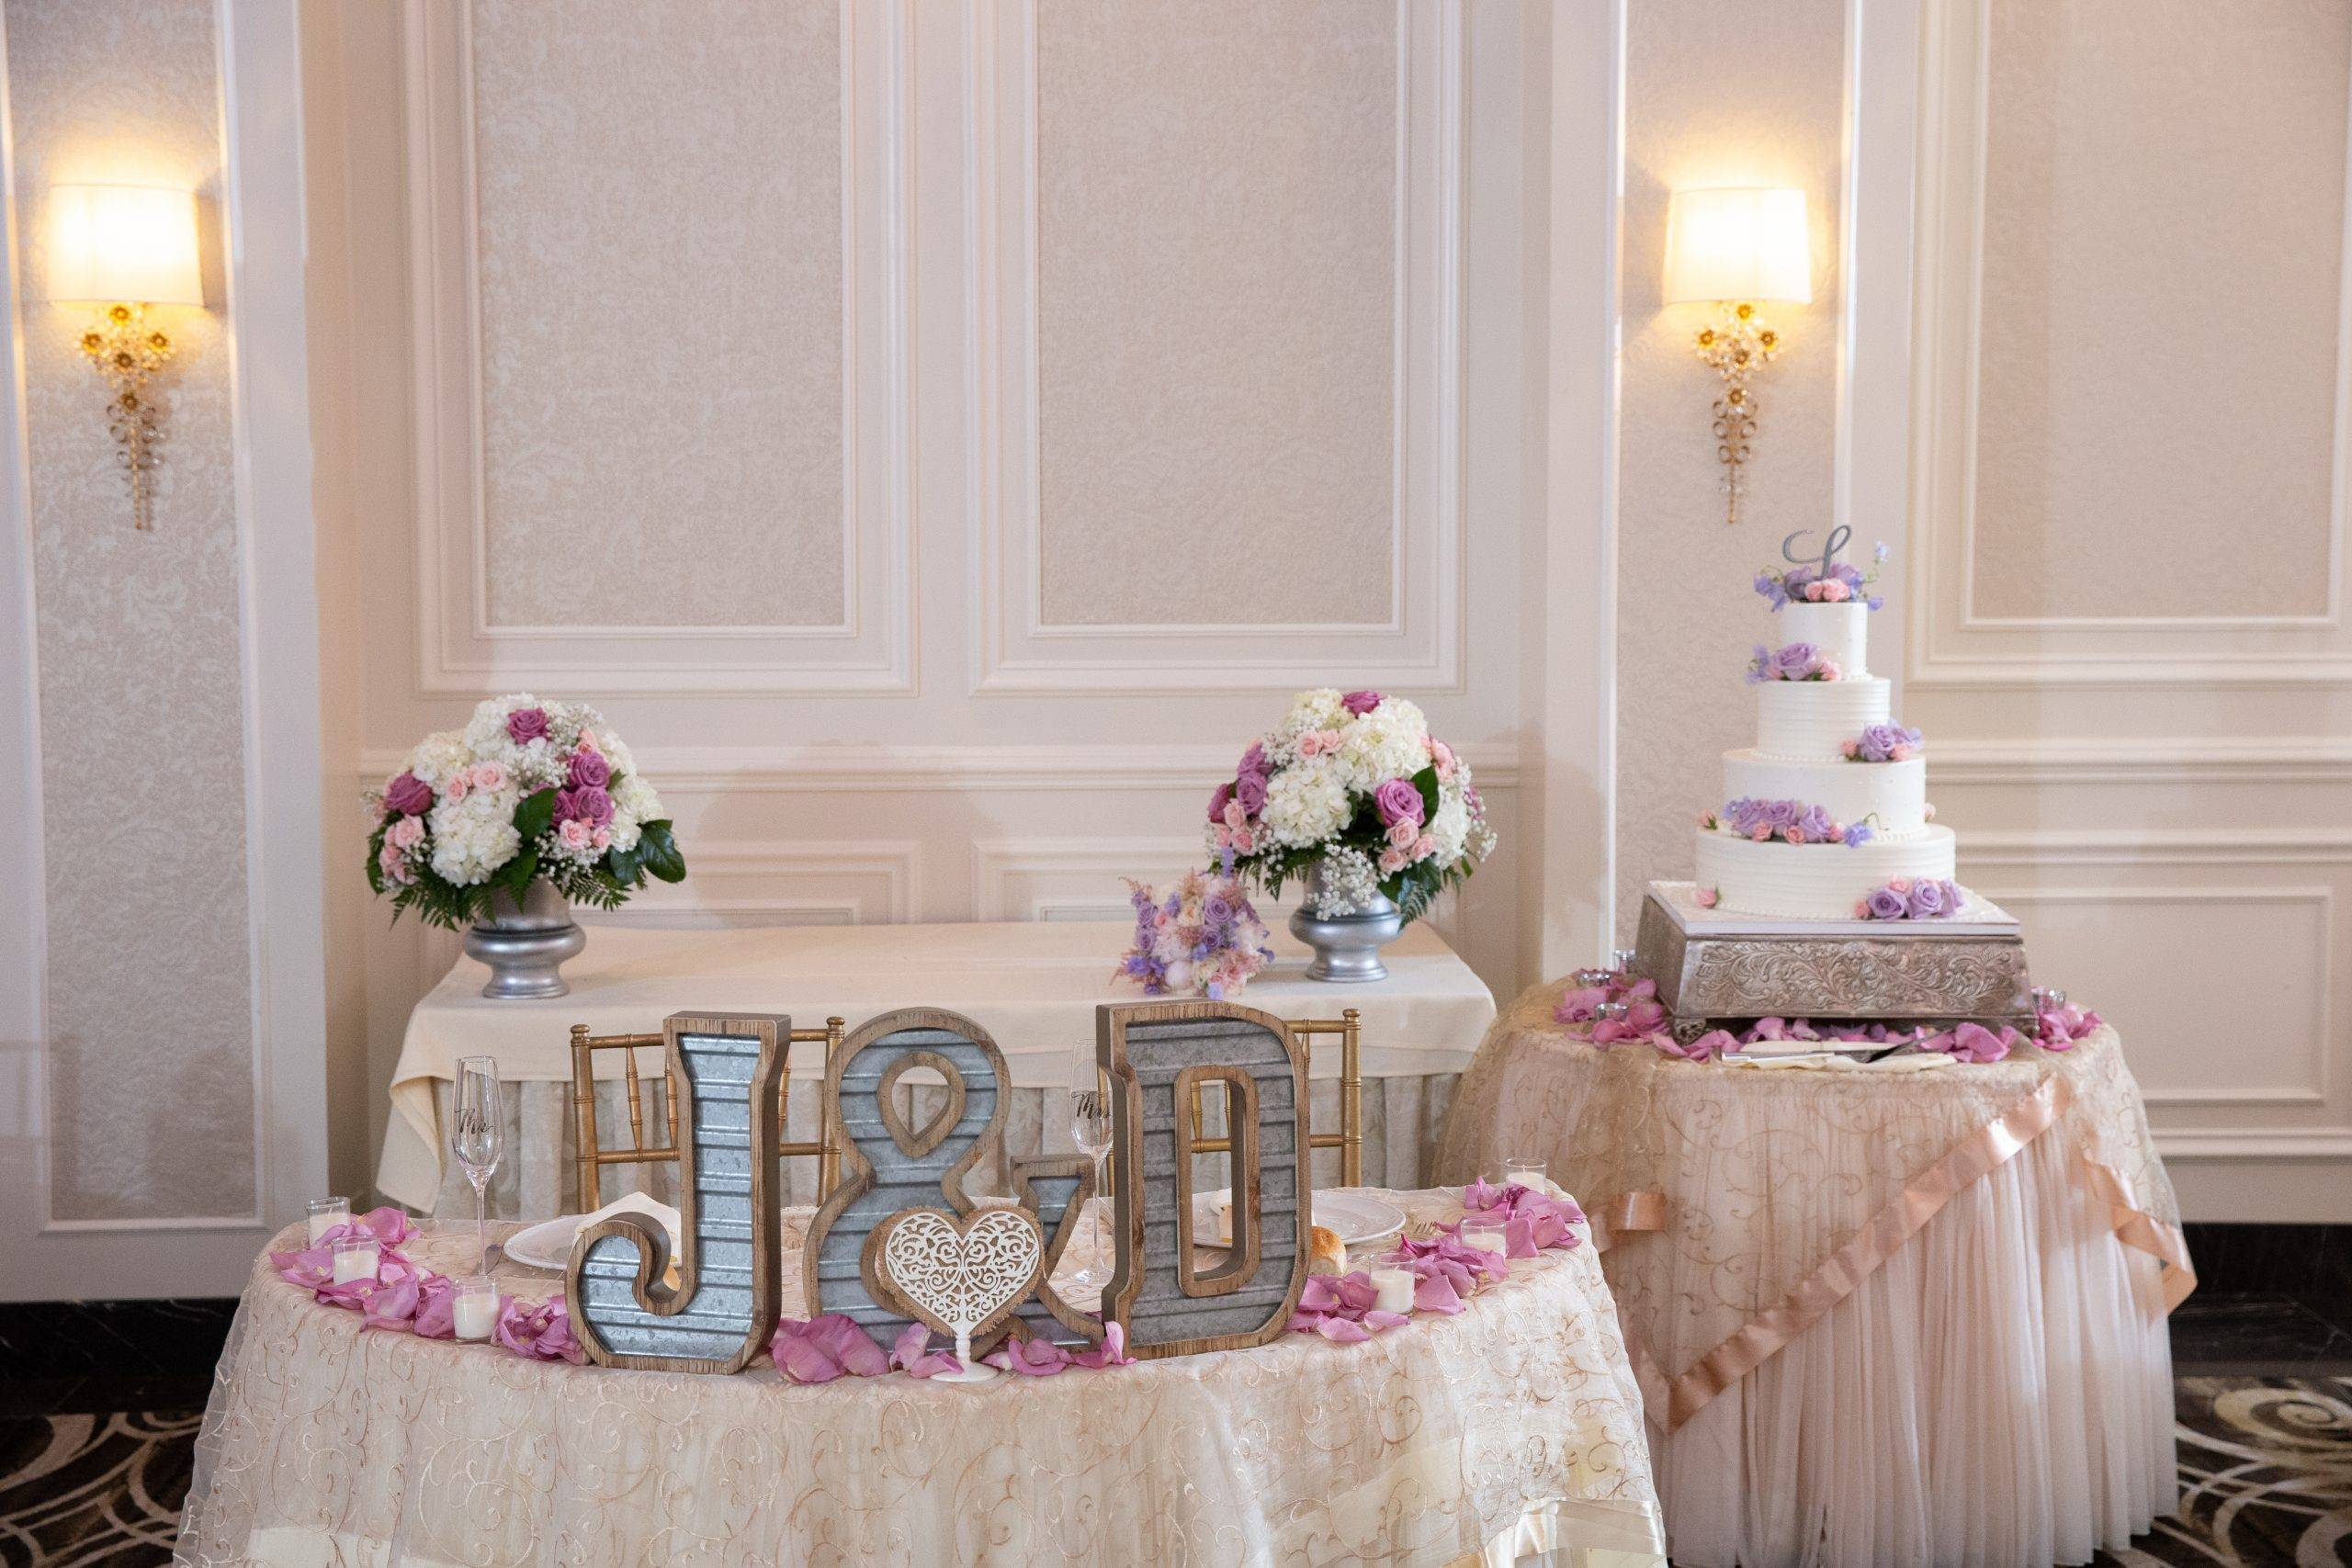 Meadow Wood wedding cake tables